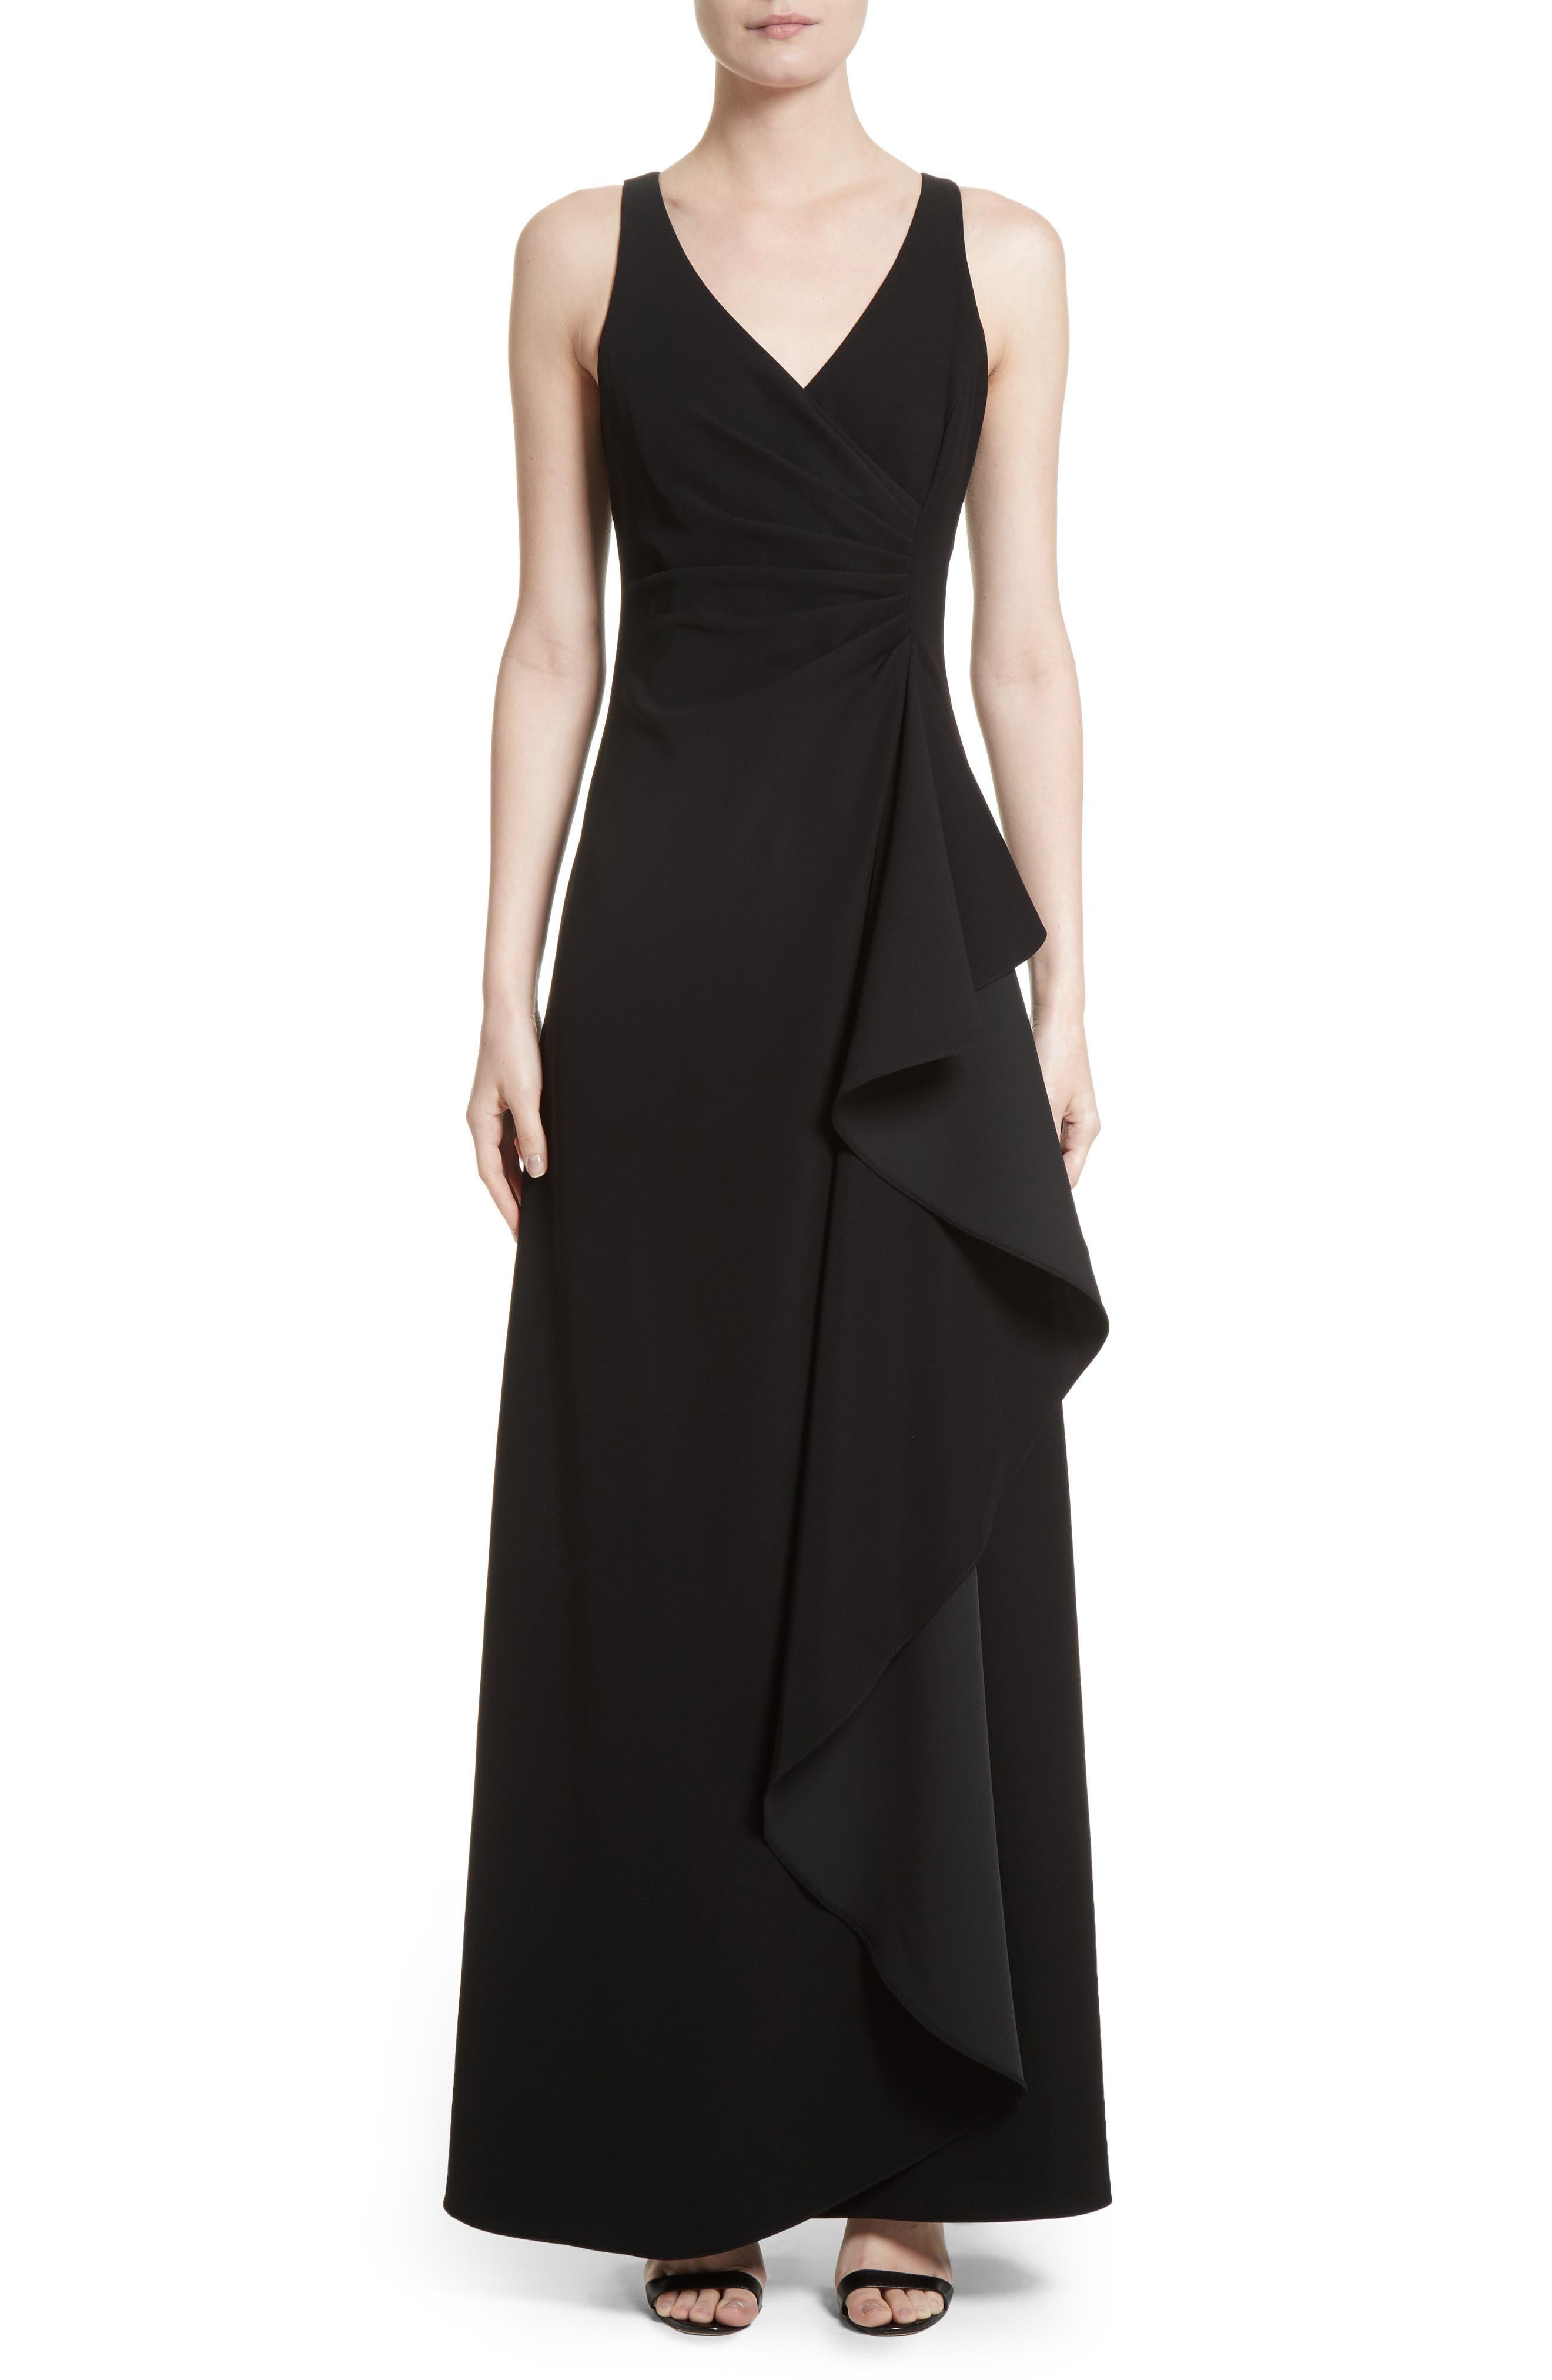 Armani Collezioni Starburst Pleat Tech Cady Gown